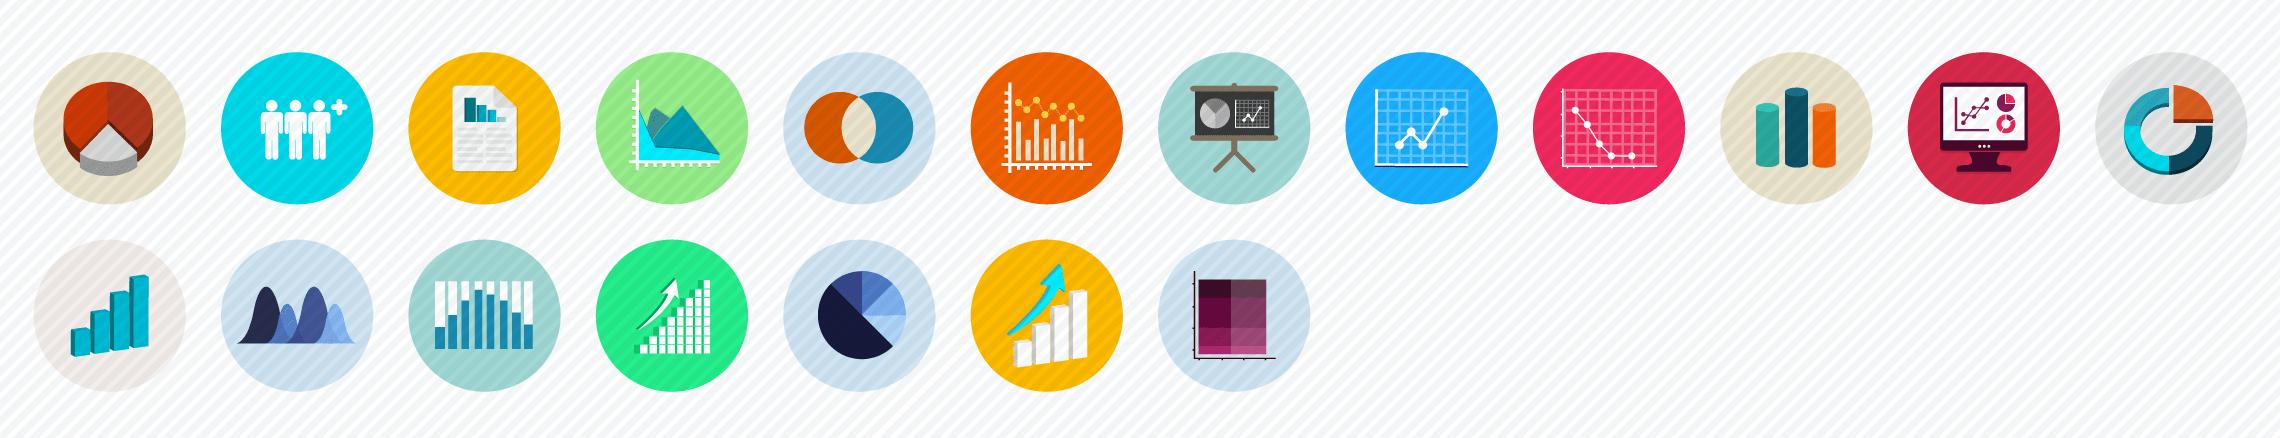 Charts flat icons